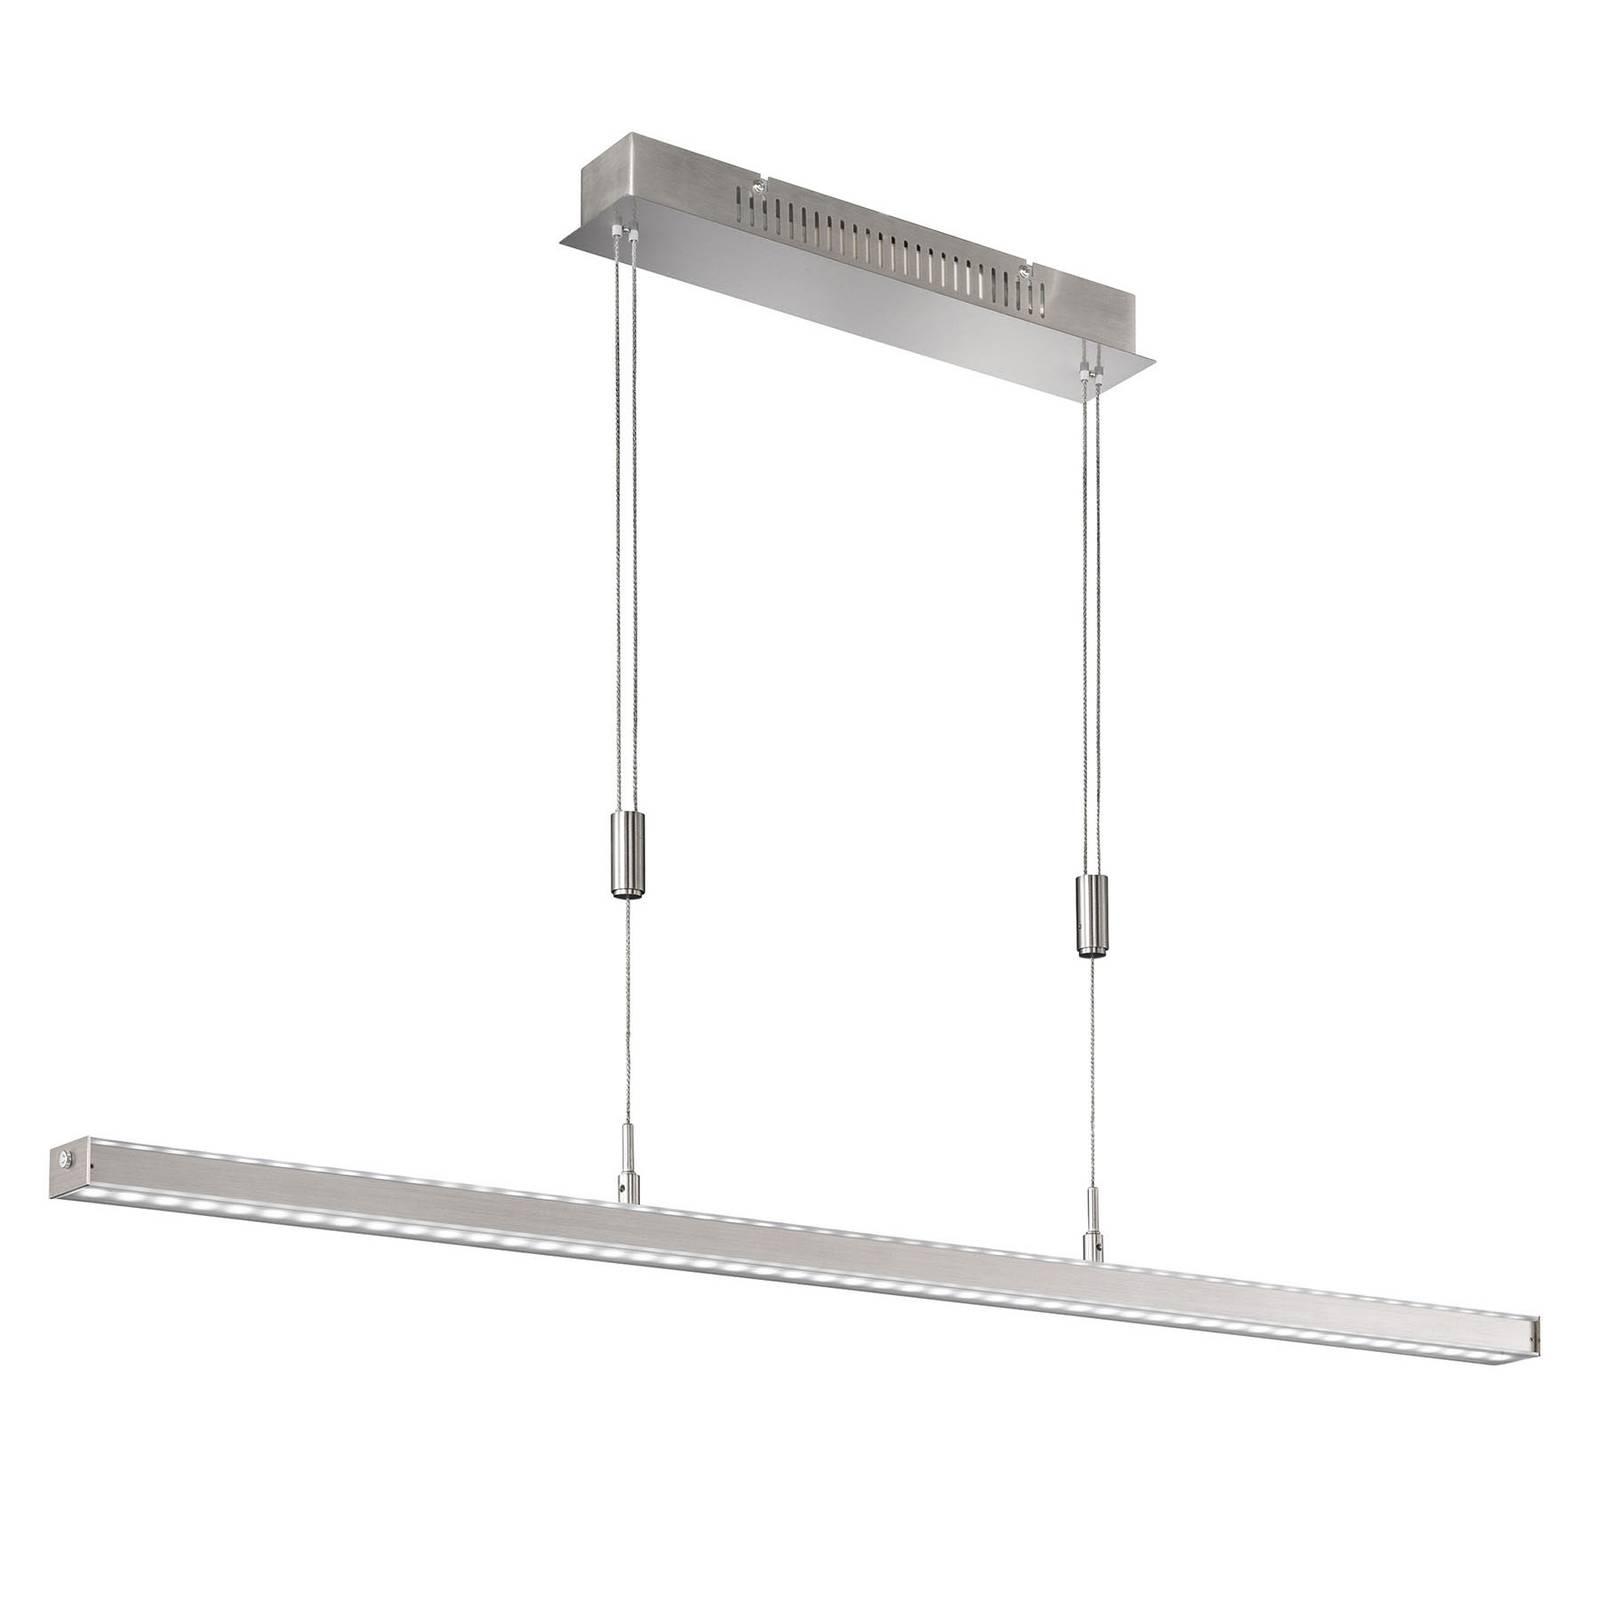 LED-riippuvalaisin Vitan TW, harmaa, pituus 150 cm